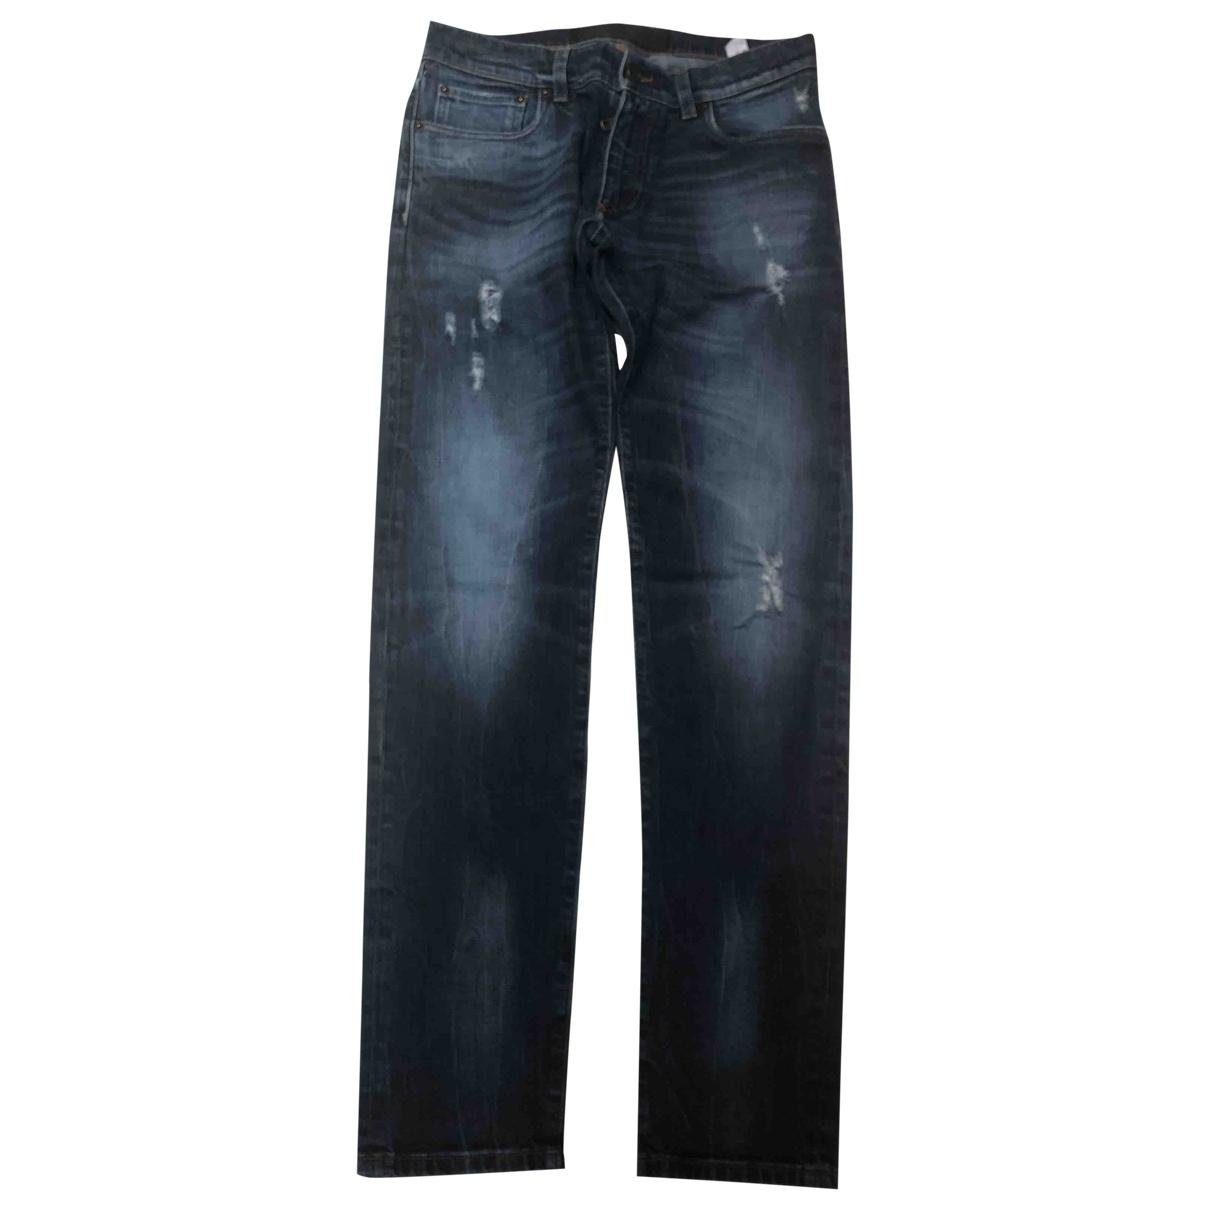 Dolce & Gabbana \N Blue Cotton - elasthane Jeans for Men 40 FR